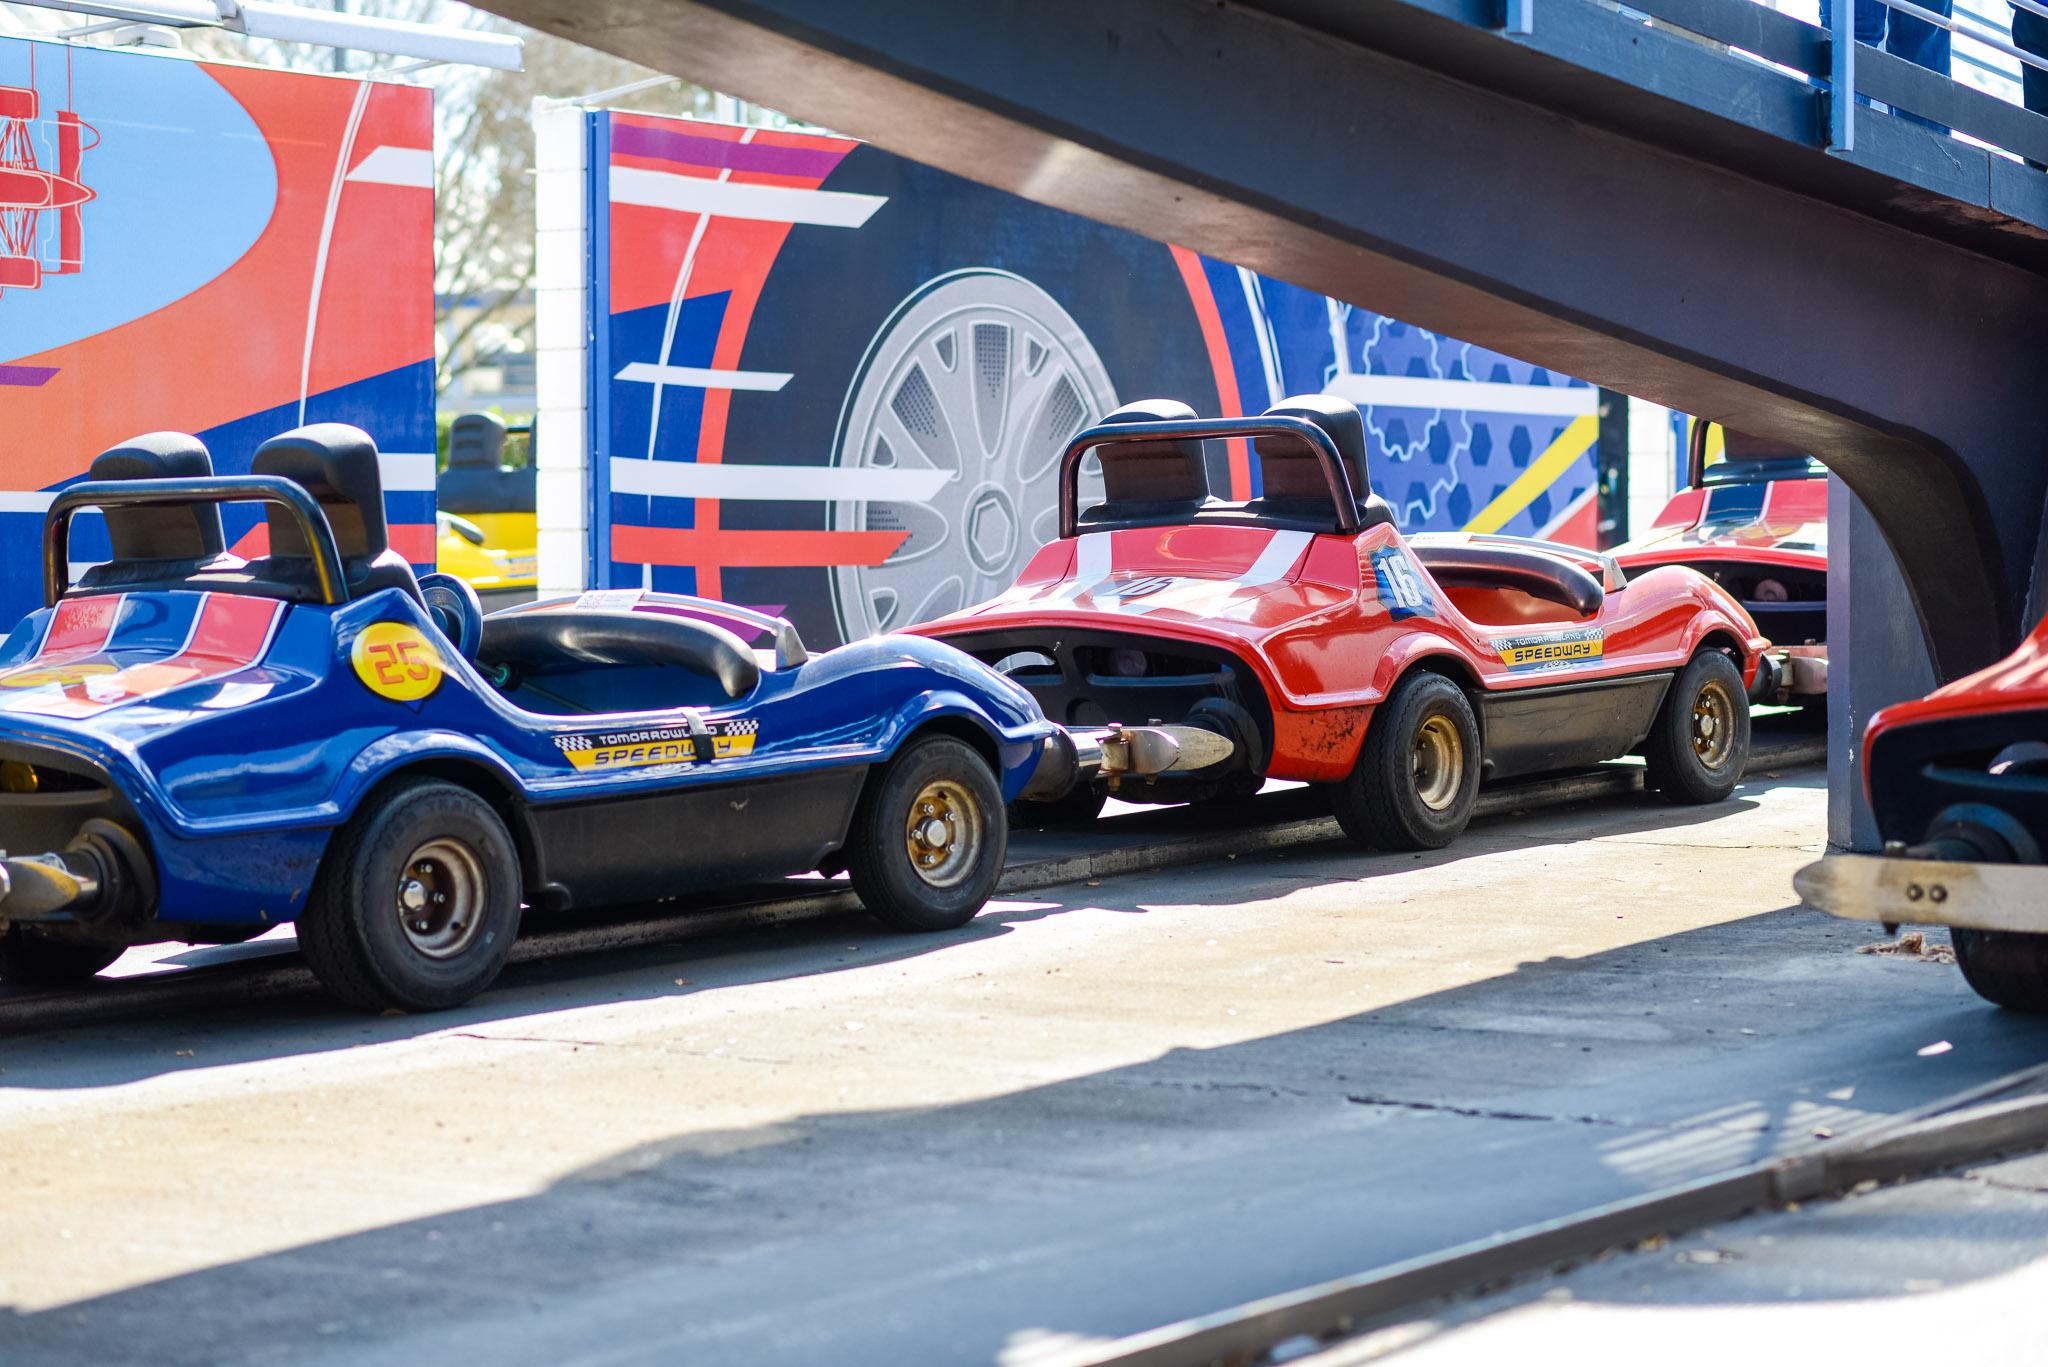 Tomorrowland Speedway 3 Lanes Open - Walt Disney World Magic Kingdom